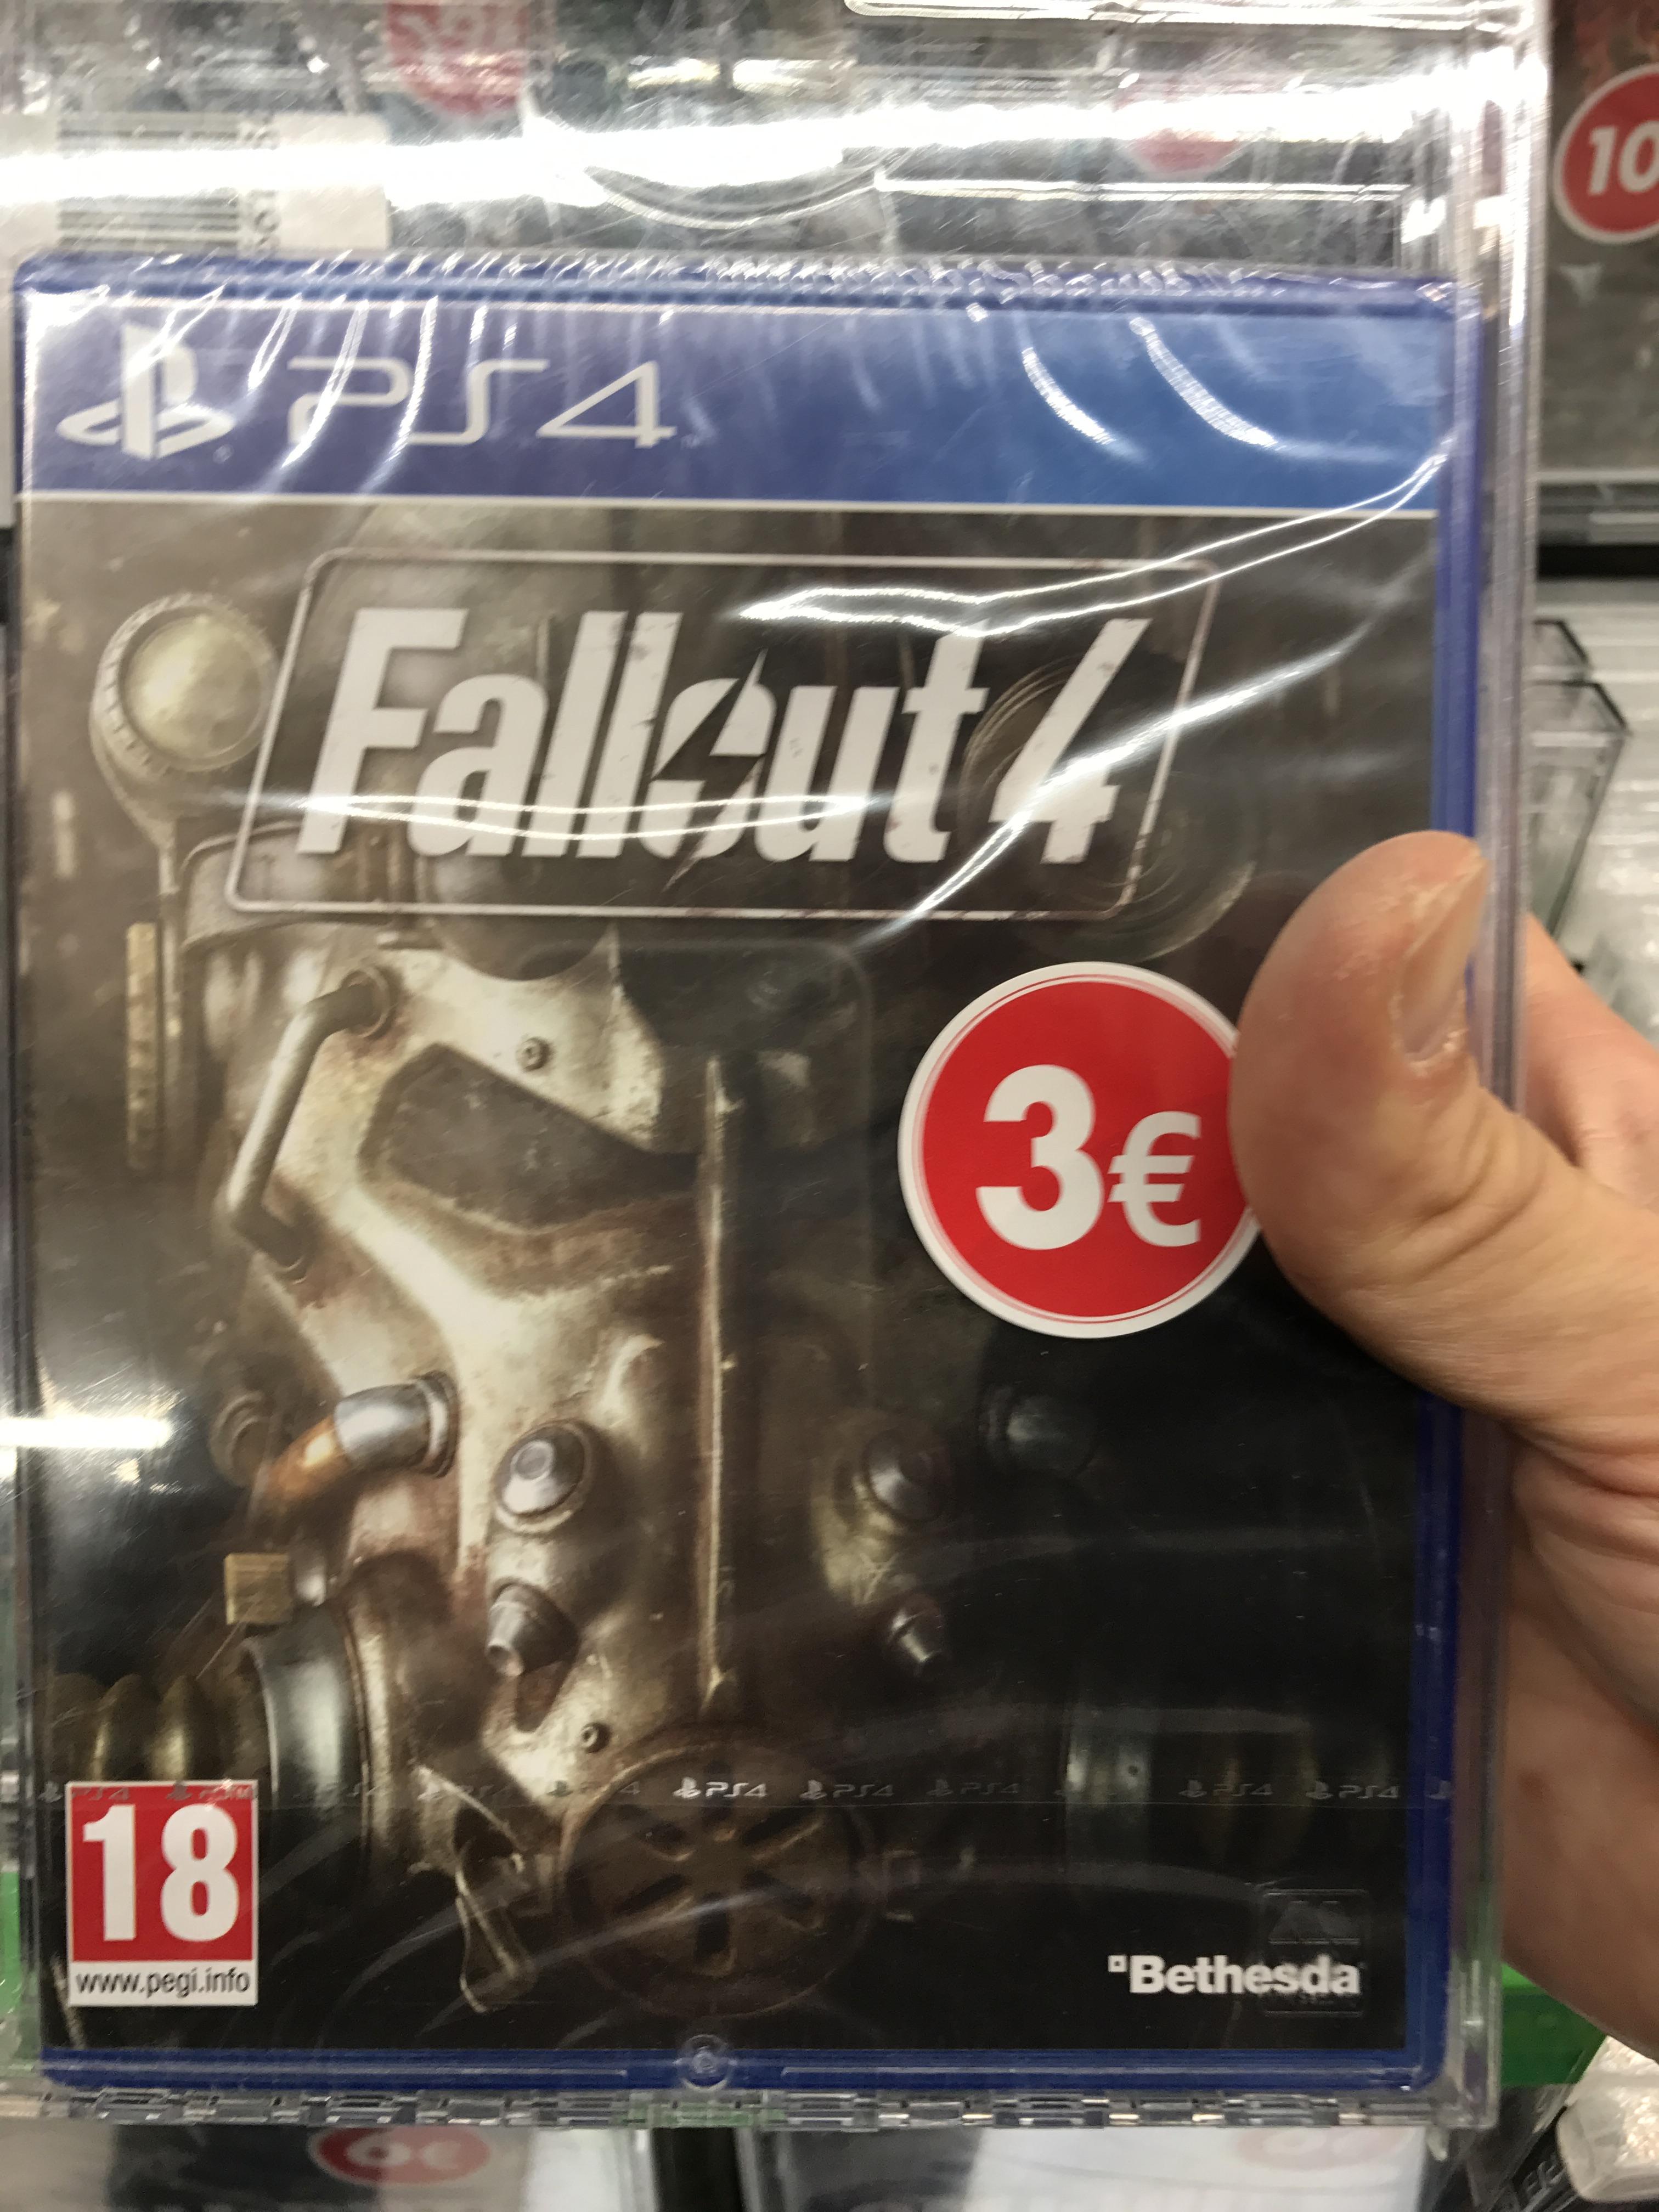 Fallout 4 sur PS4 ou XBox One